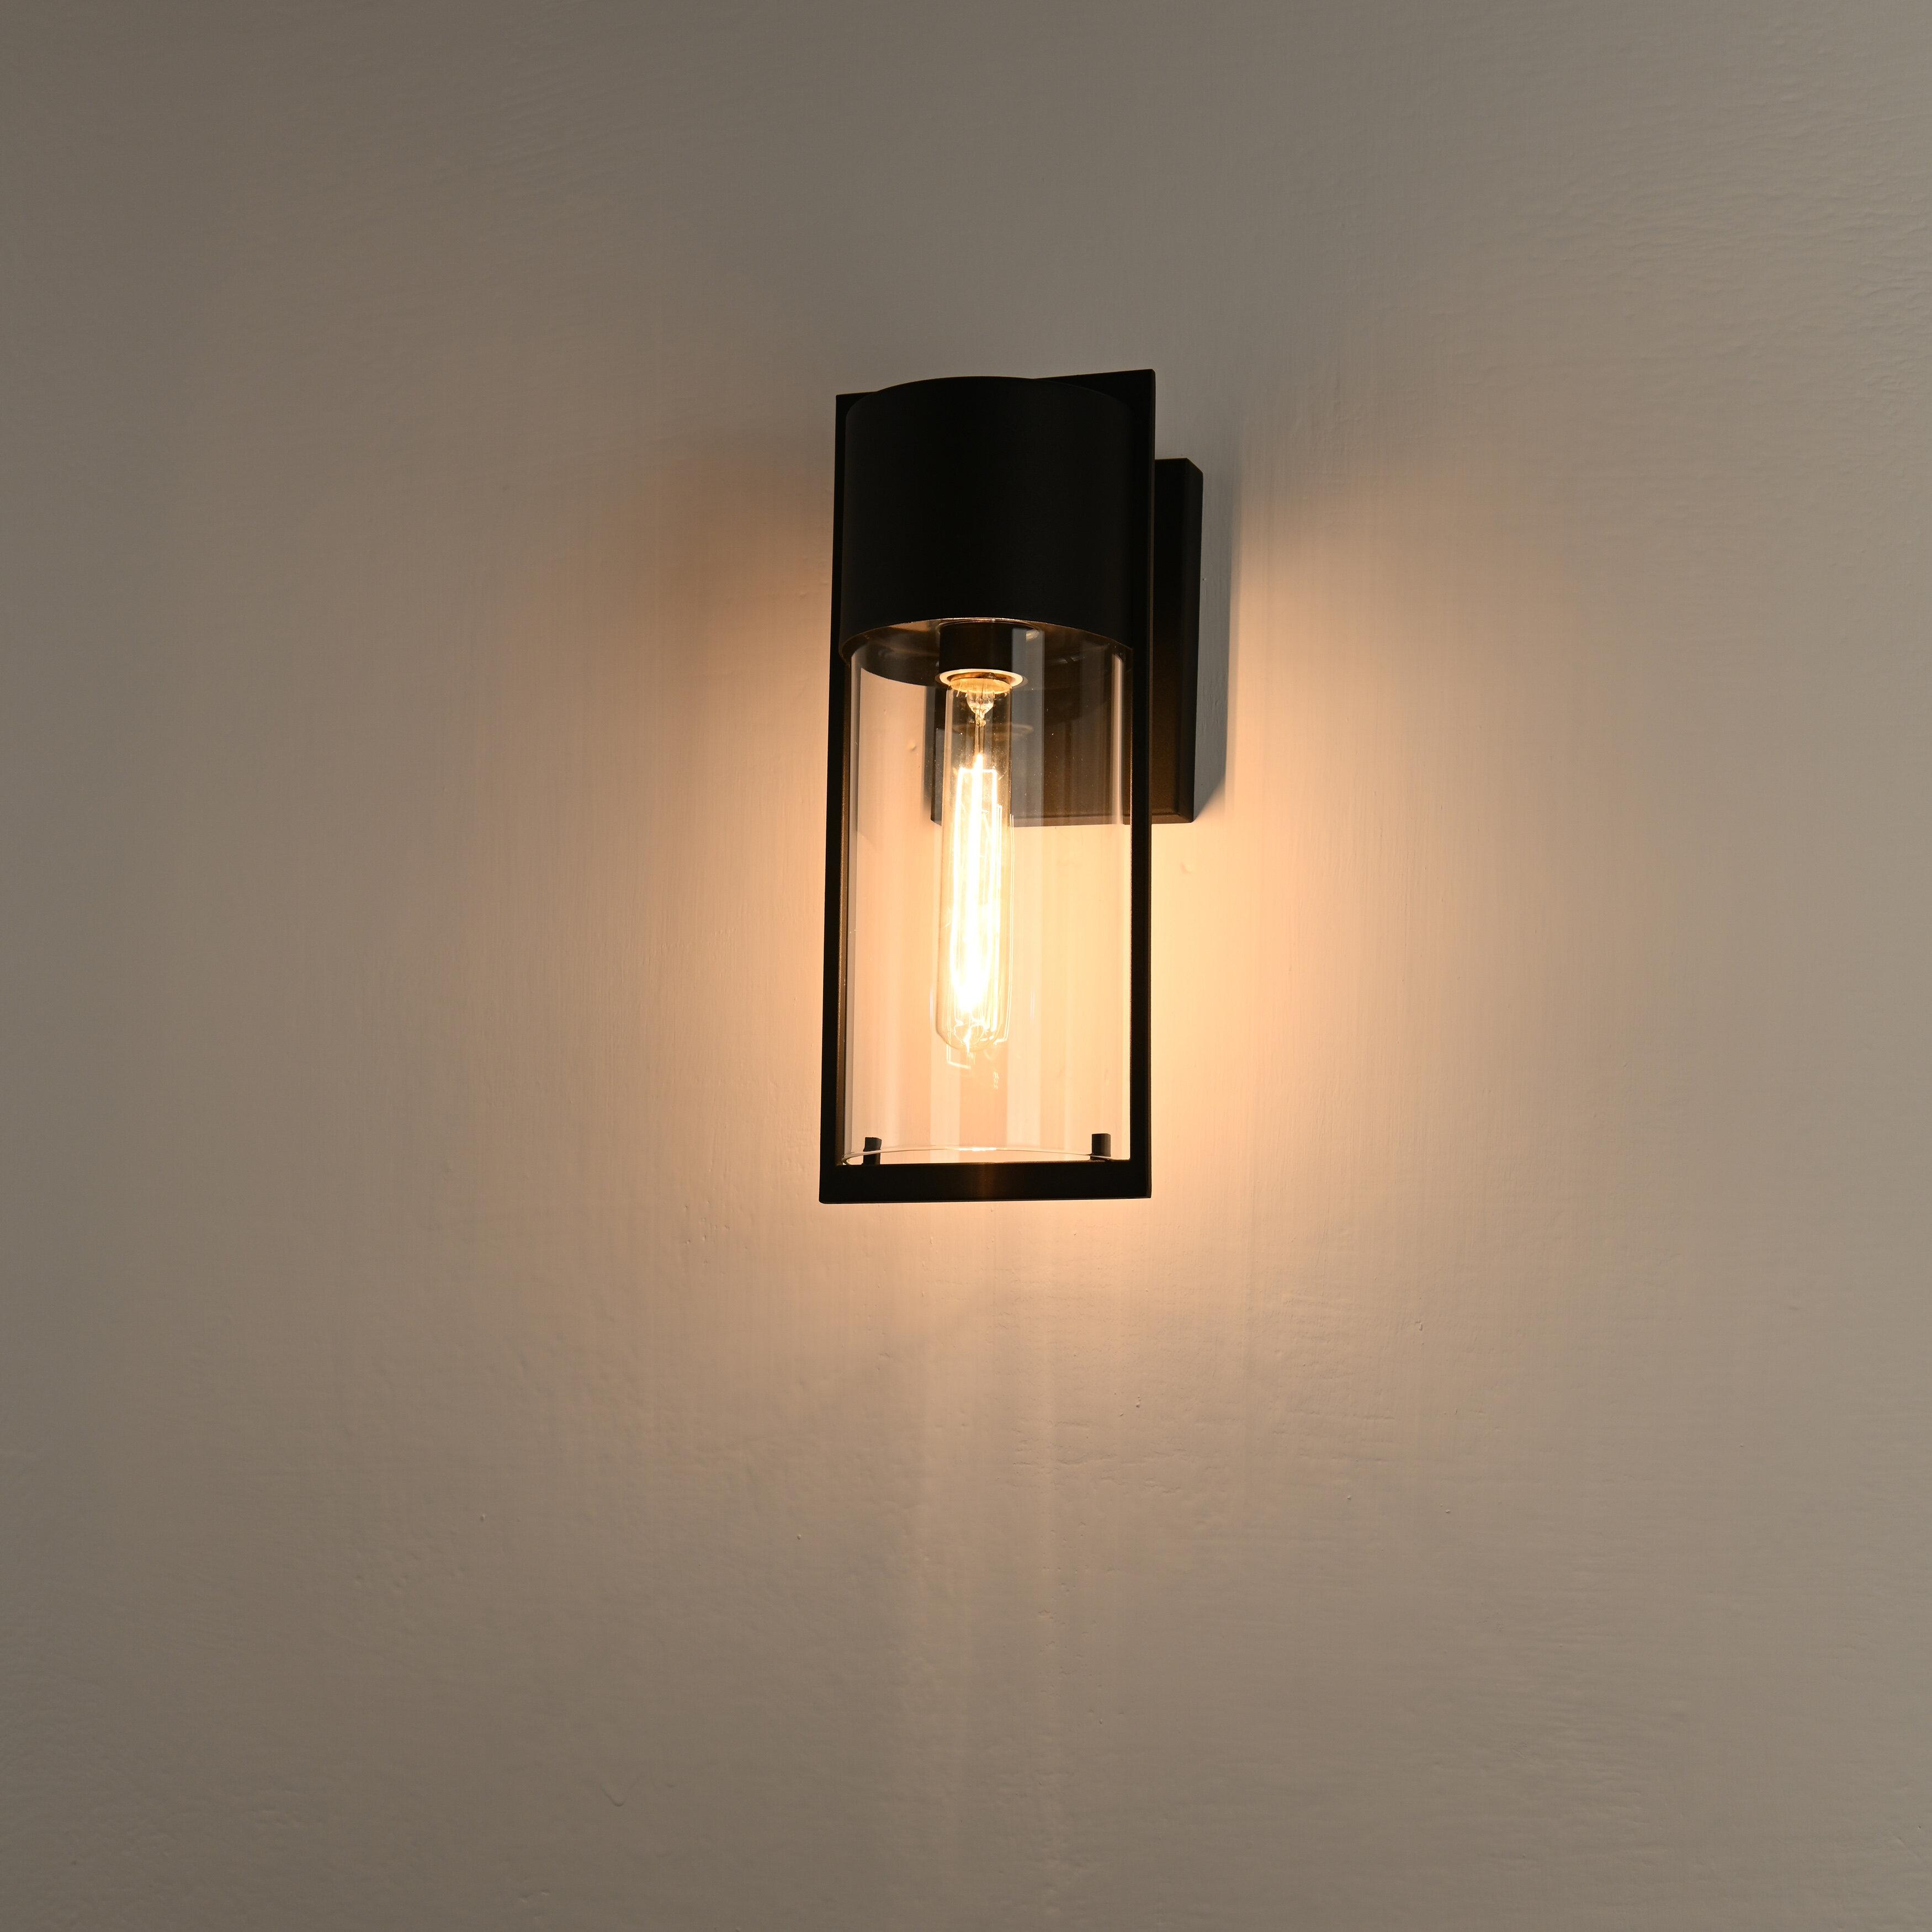 Wrought Studio Tyler Kridia 1 Light Textured Black Outdoor Wall Sconce 14 Height